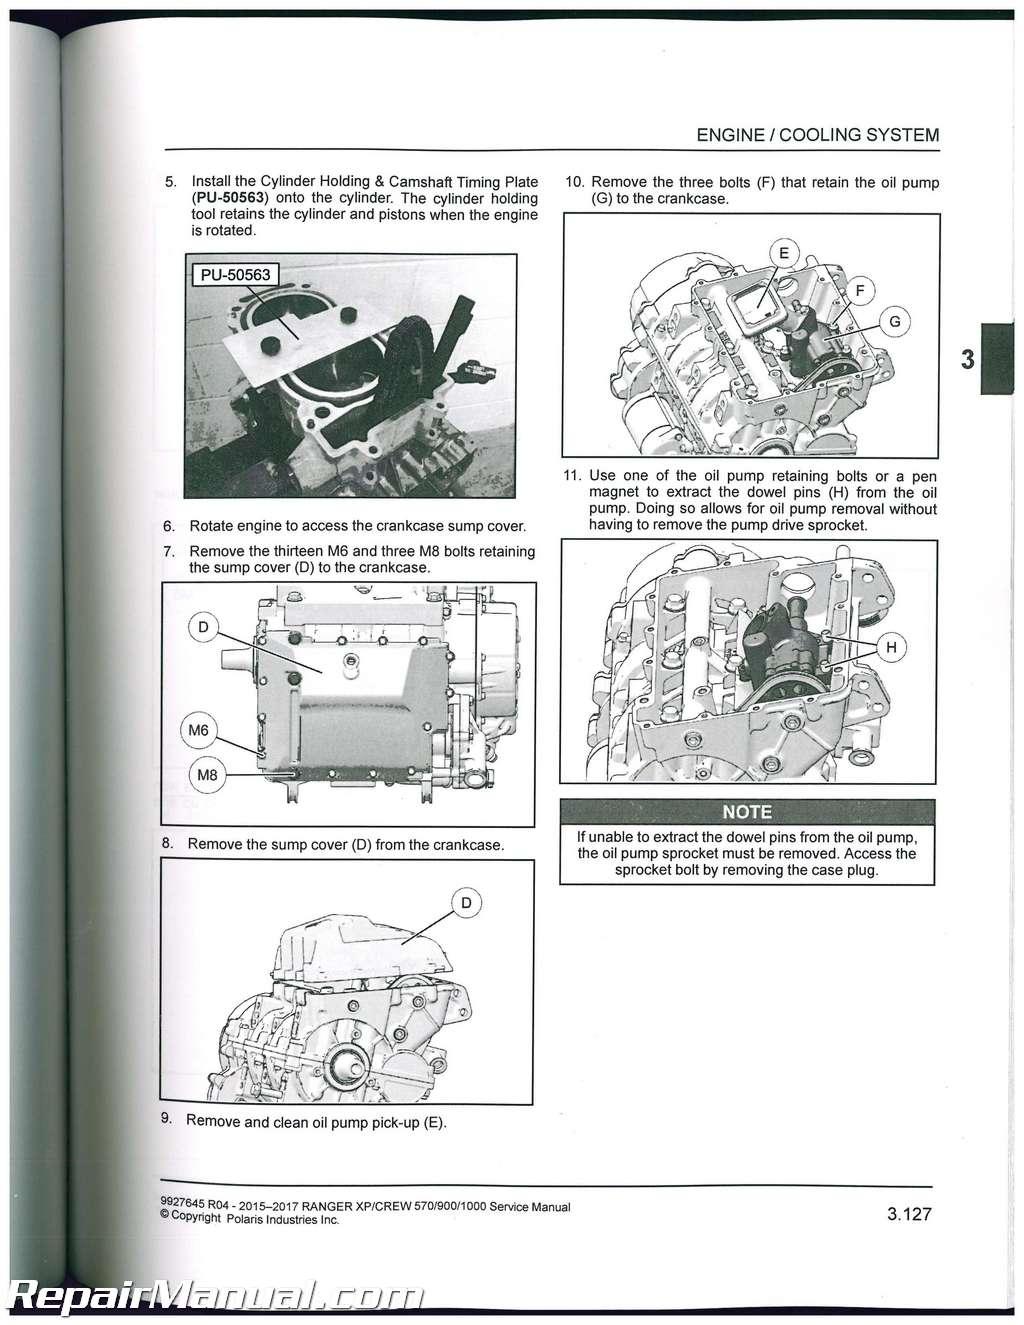 Wiring Diagrams 2016 Polaris Ranger 570 Just Wirings Diagram 2014 Schematic 35 Efi